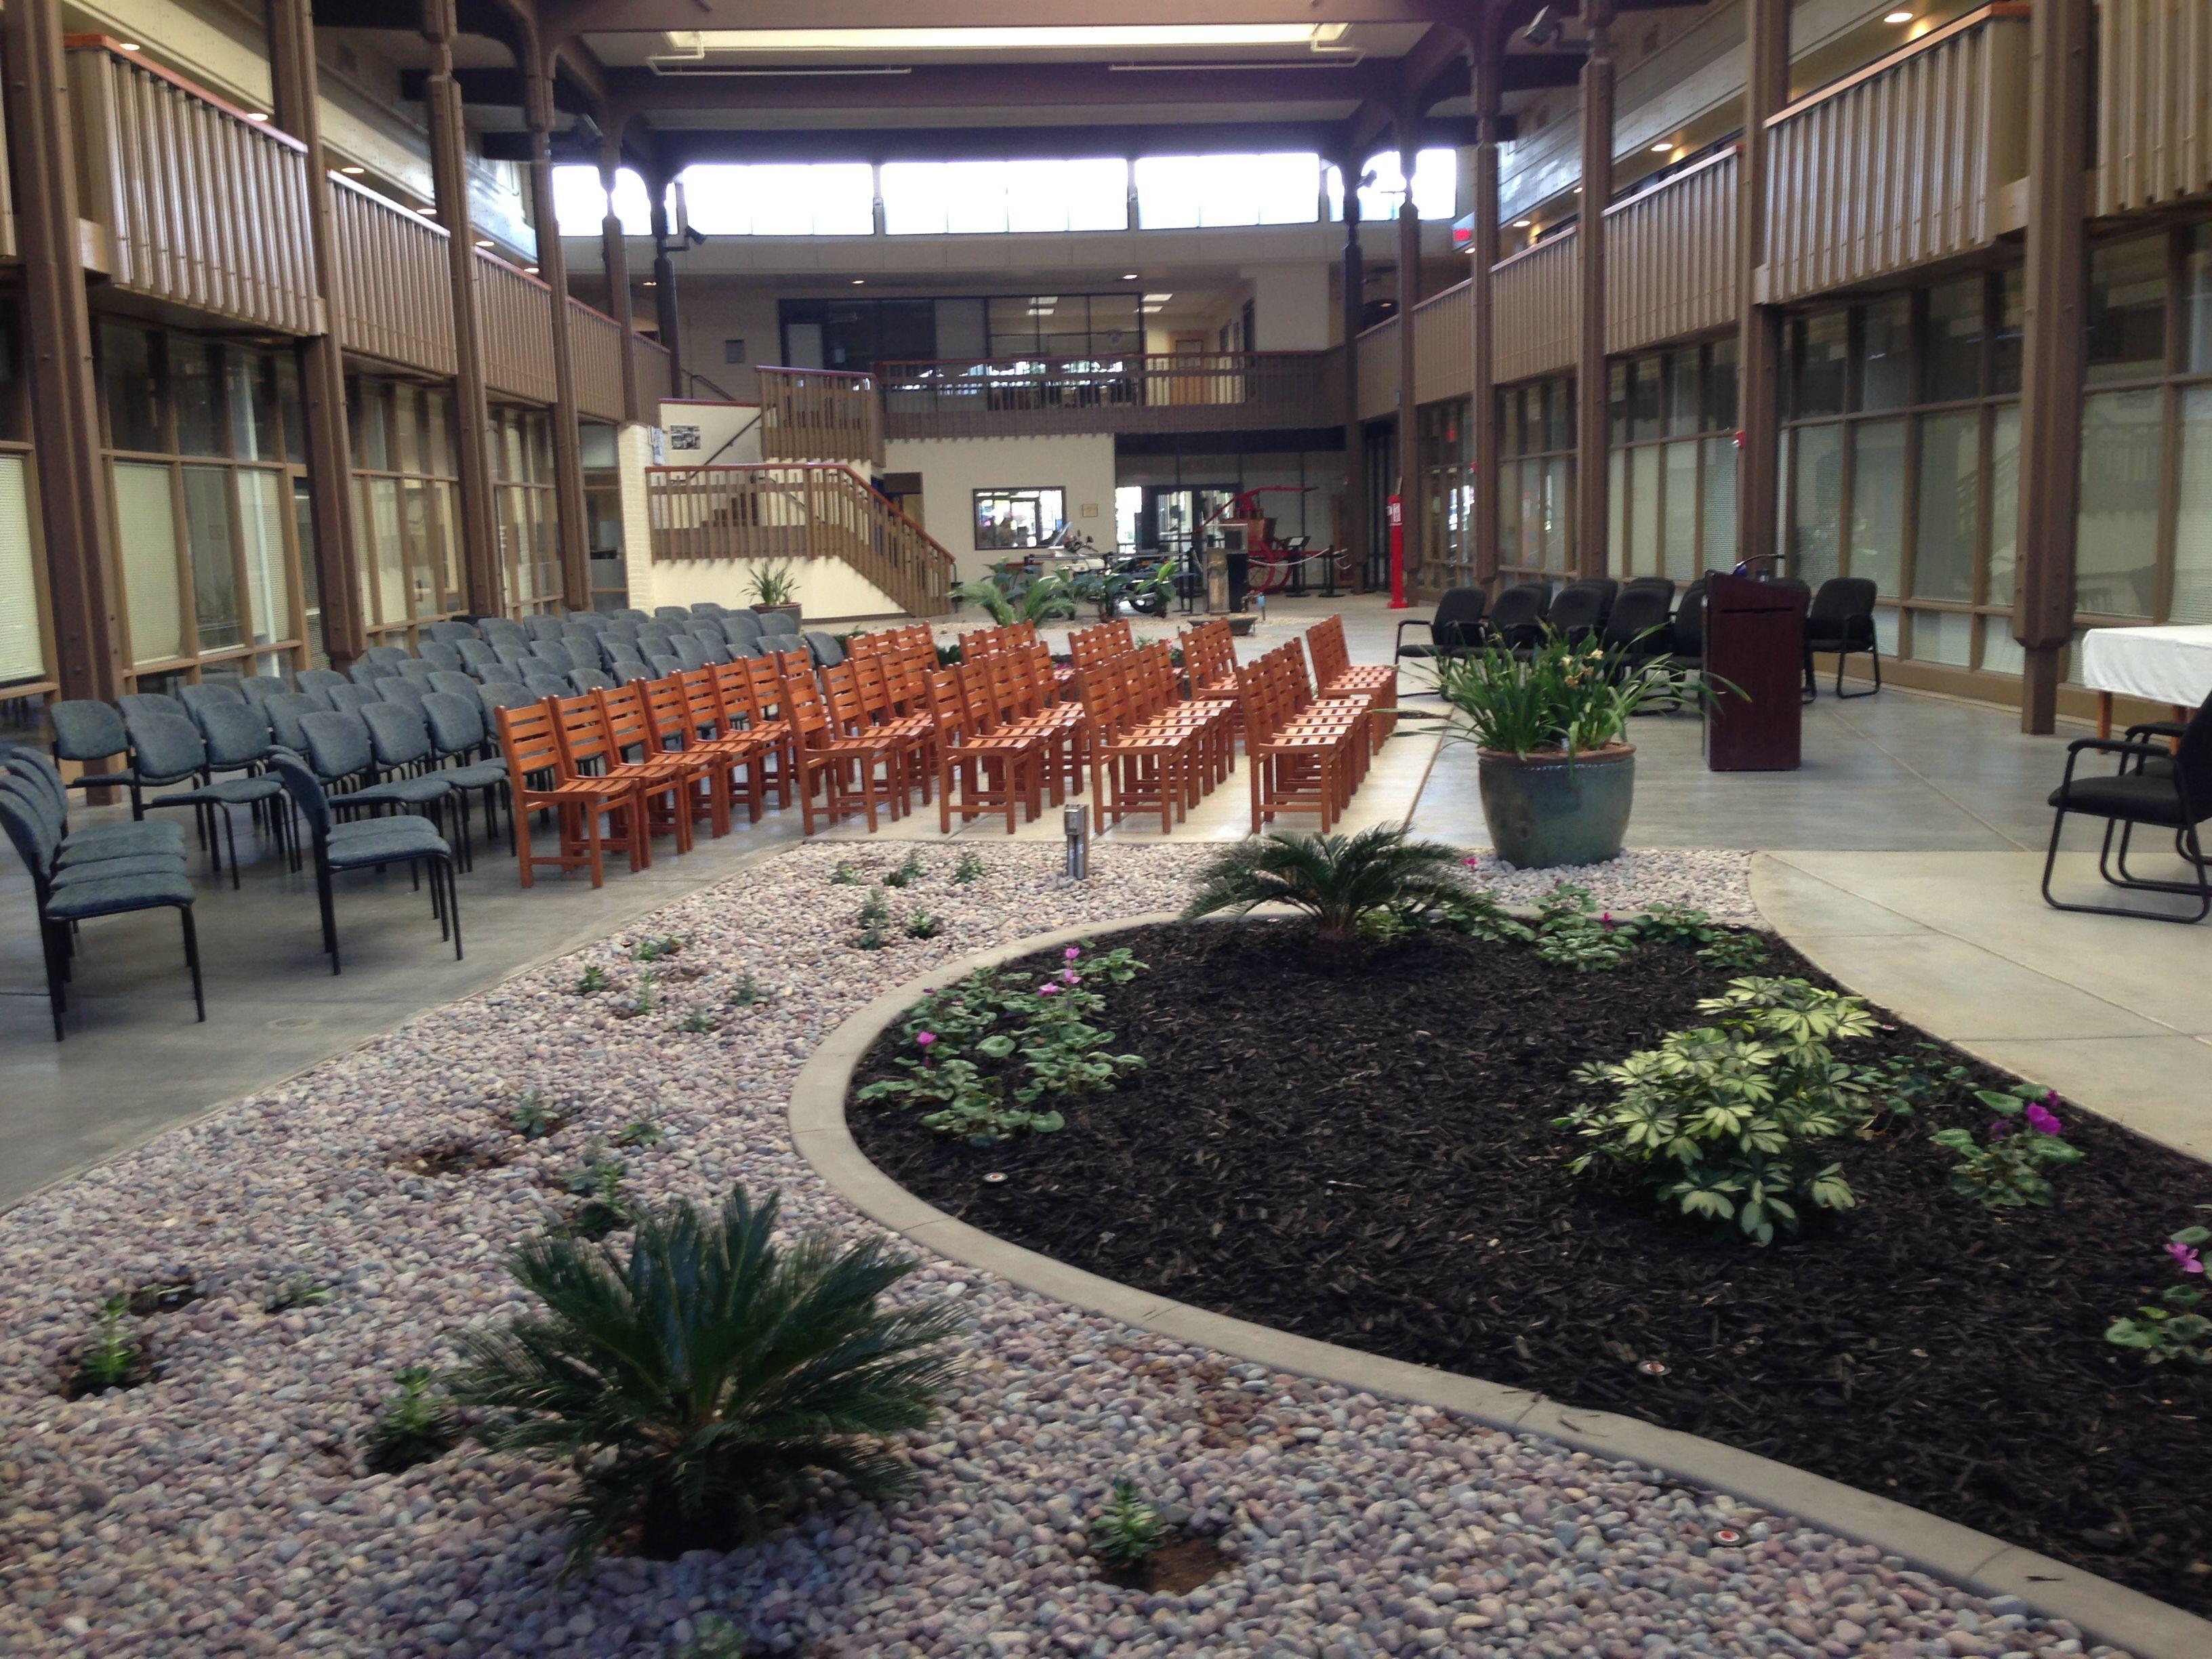 Sacramento Public Safety Center Atrium, all ready for the